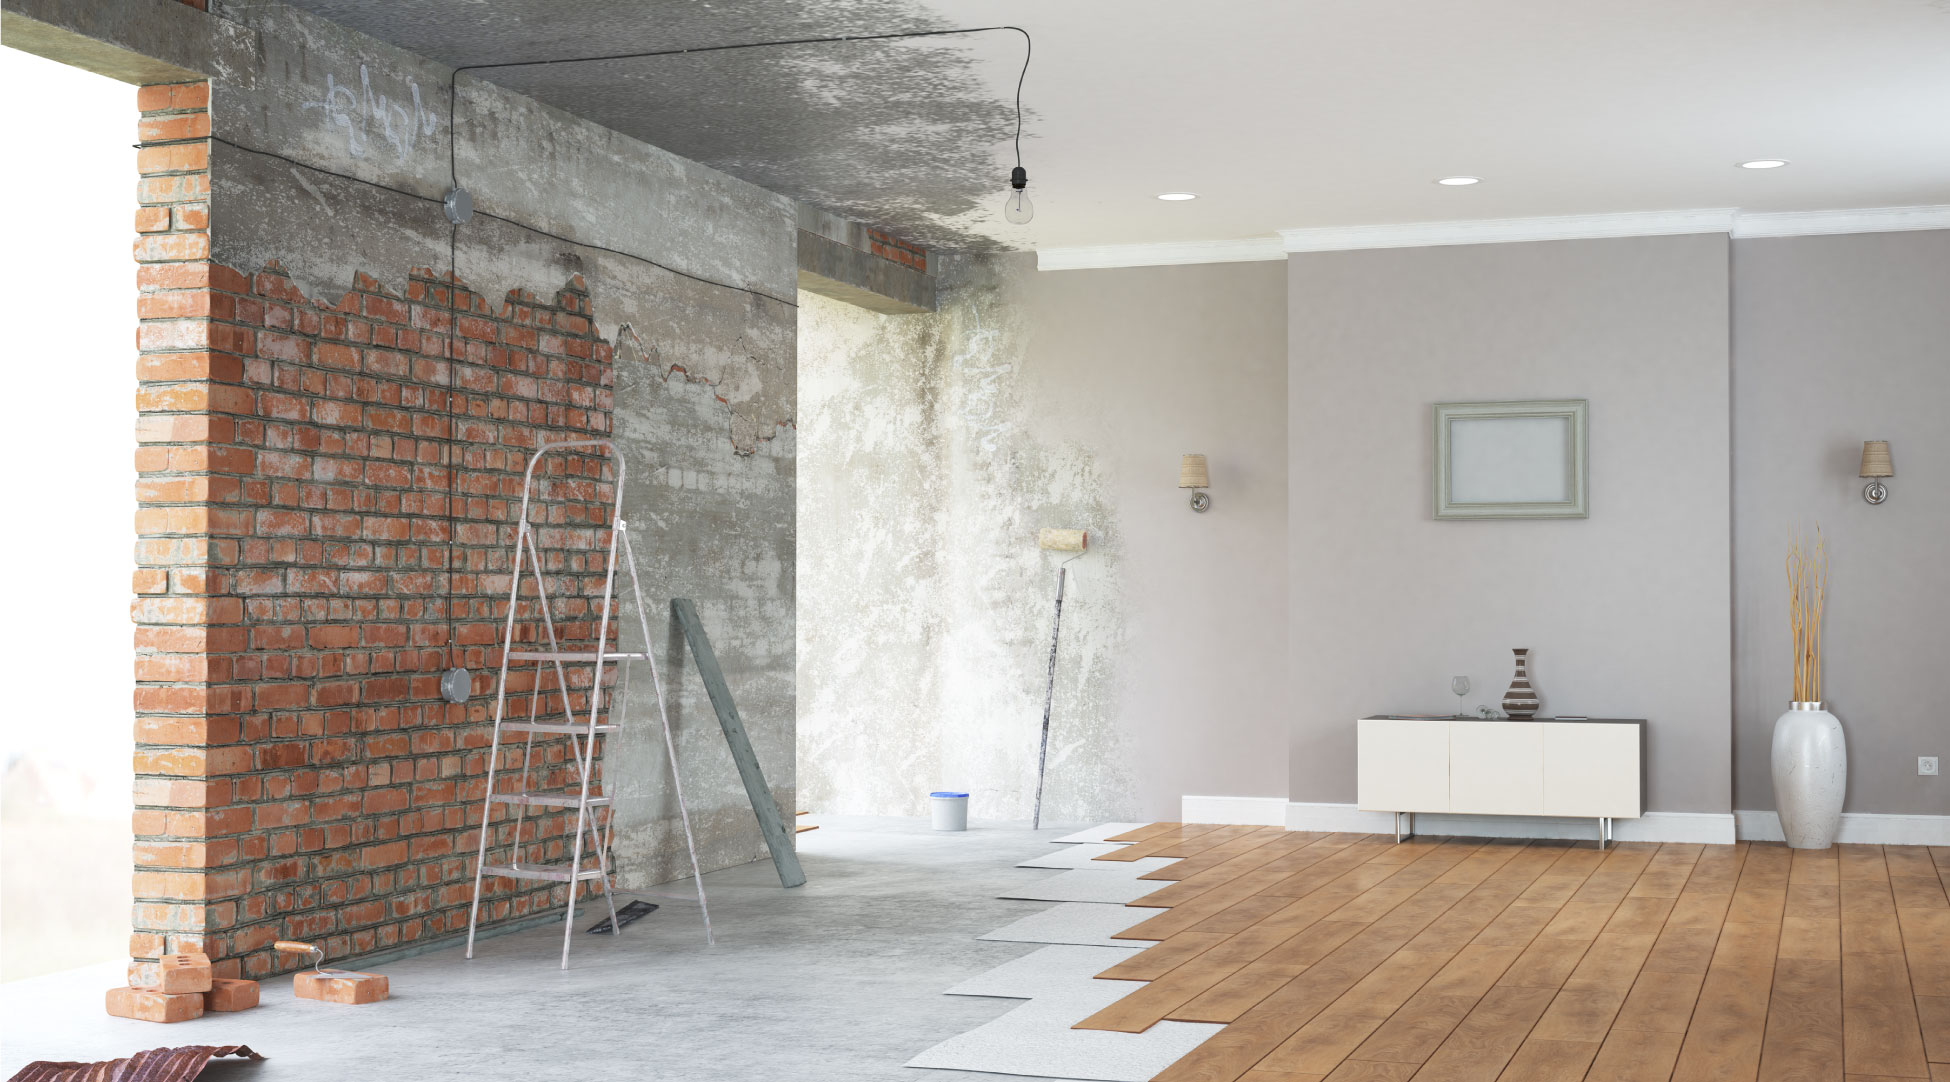 travaux maison isolation chantier